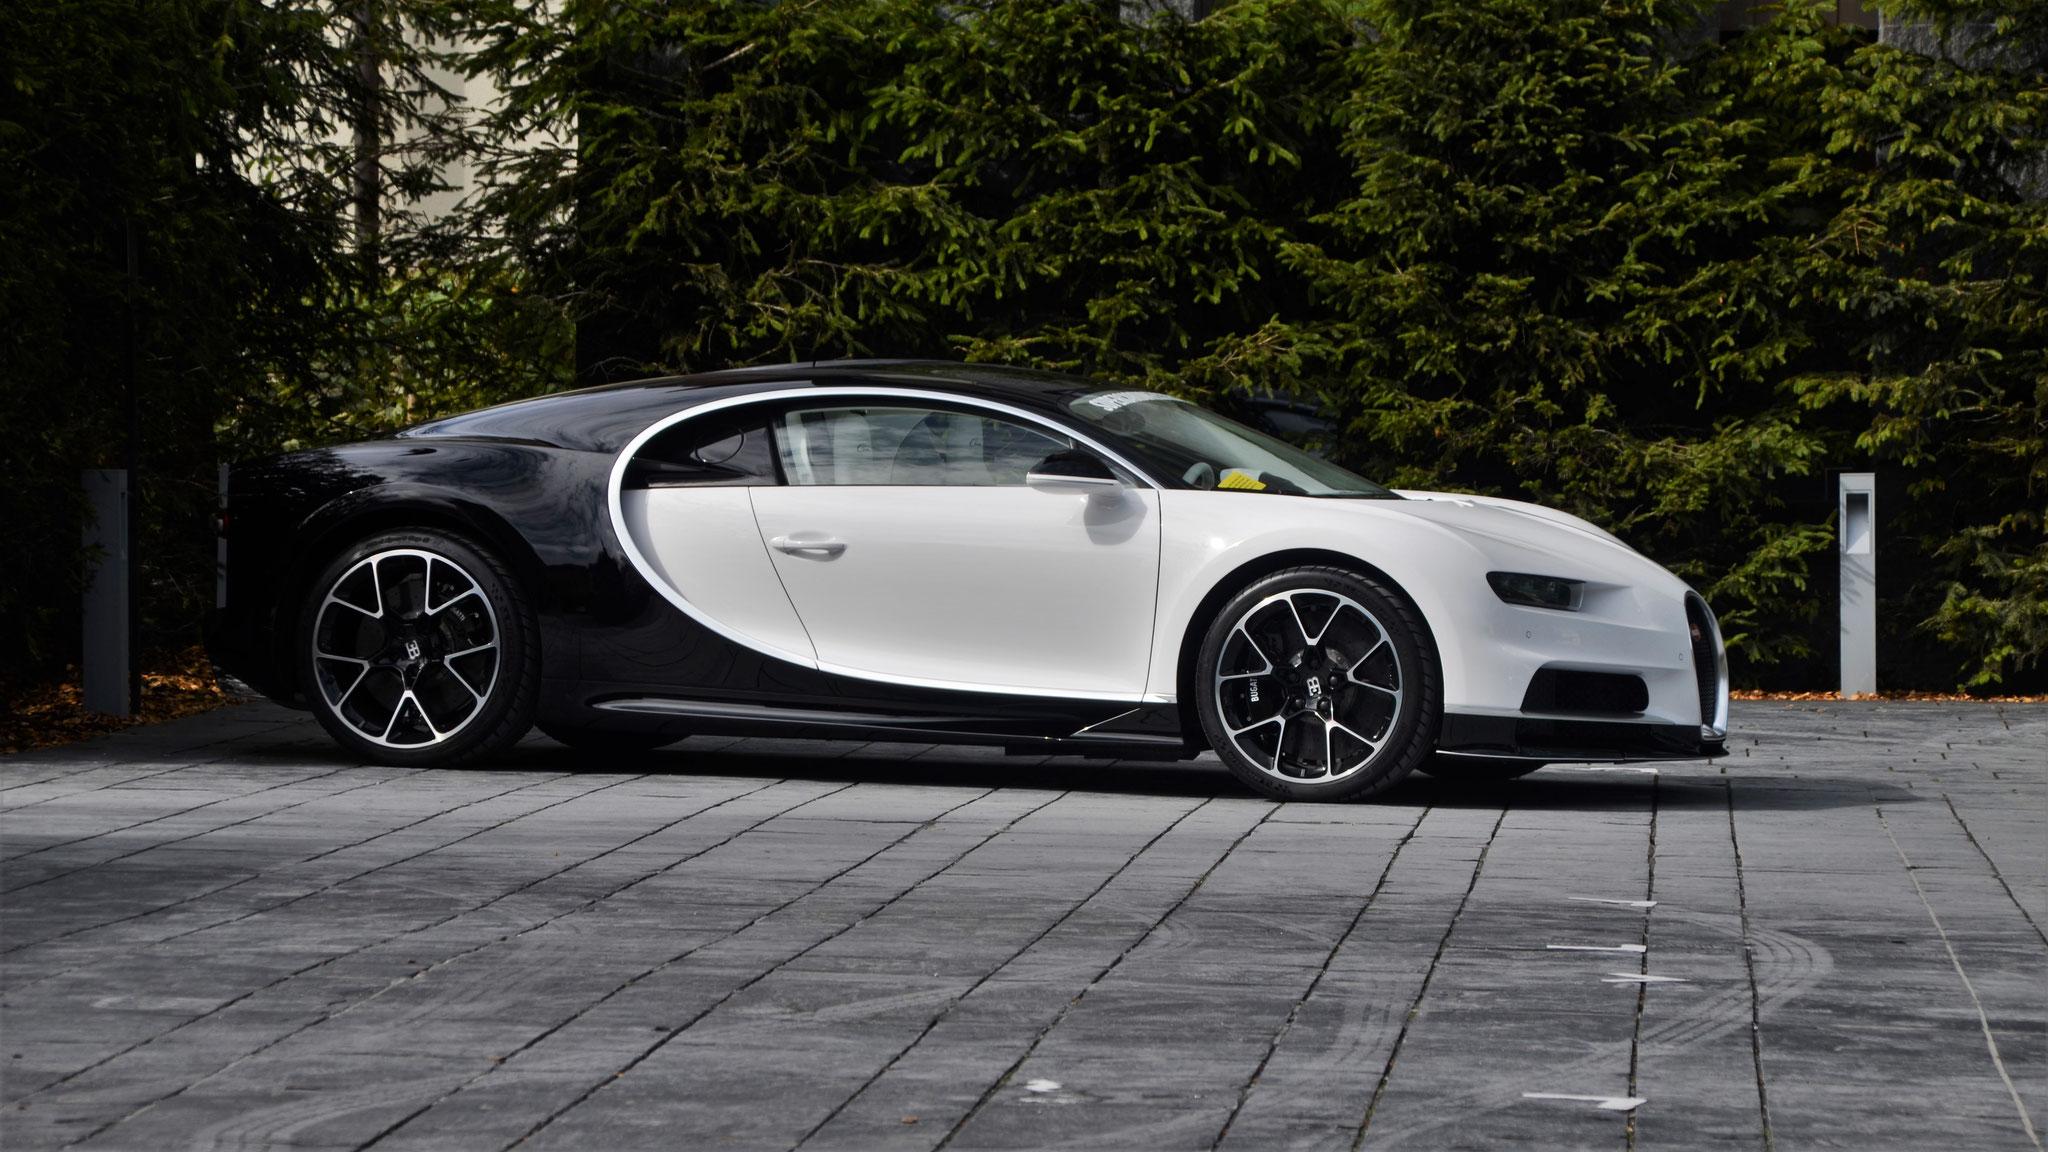 Bugatti Chiron - LX18-DFZ (GB)